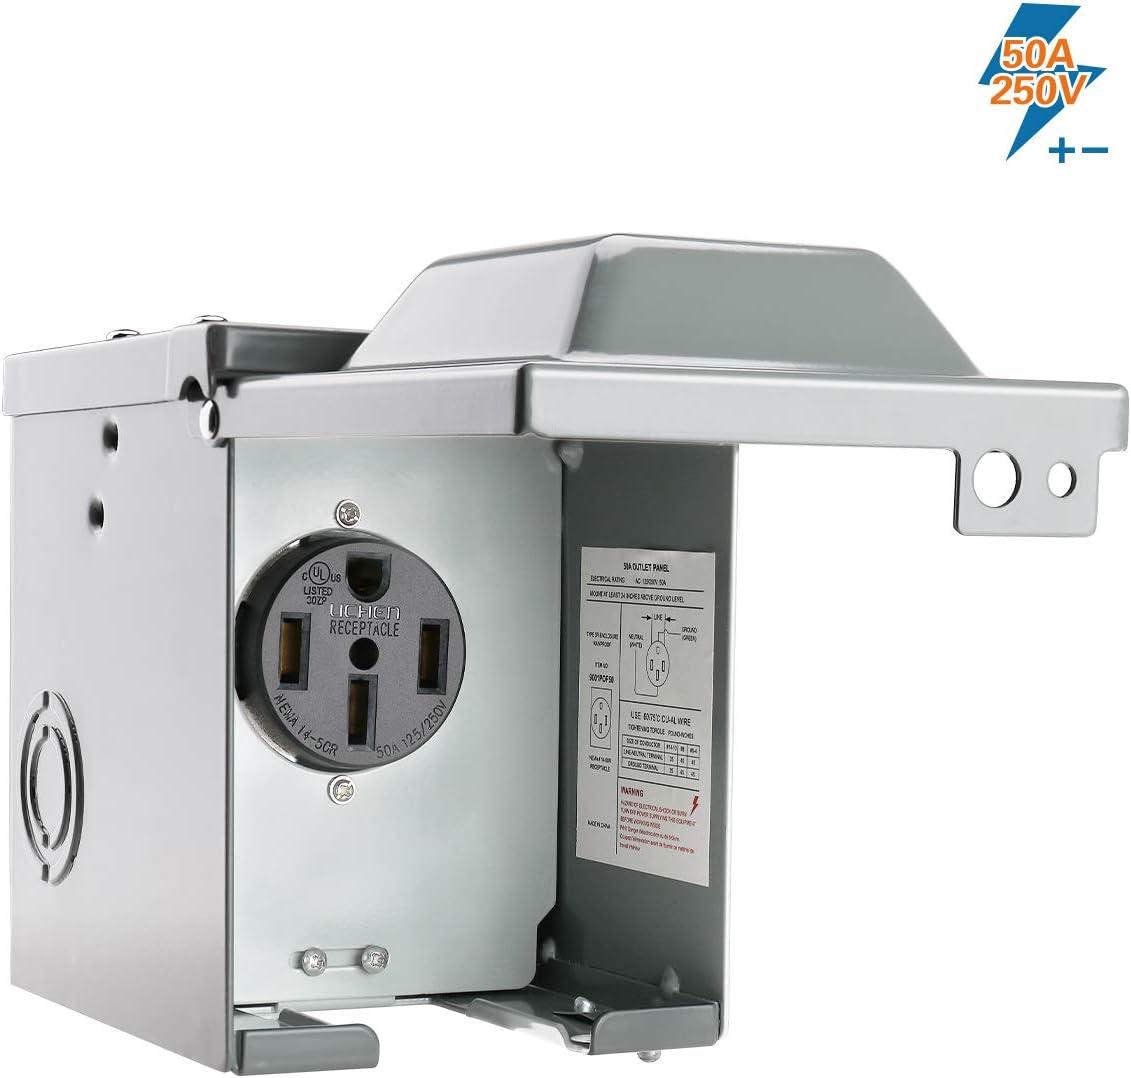 BougeRV 50 Amp 125/250 Volt RV Power Outlet Box,Enclosed Lockable Weatherproof Outdoor Electrical NEMA 14-50R Receptacle,ETL Listed,For RV Camper Travel Trailer Motorhome Electric Car Generator